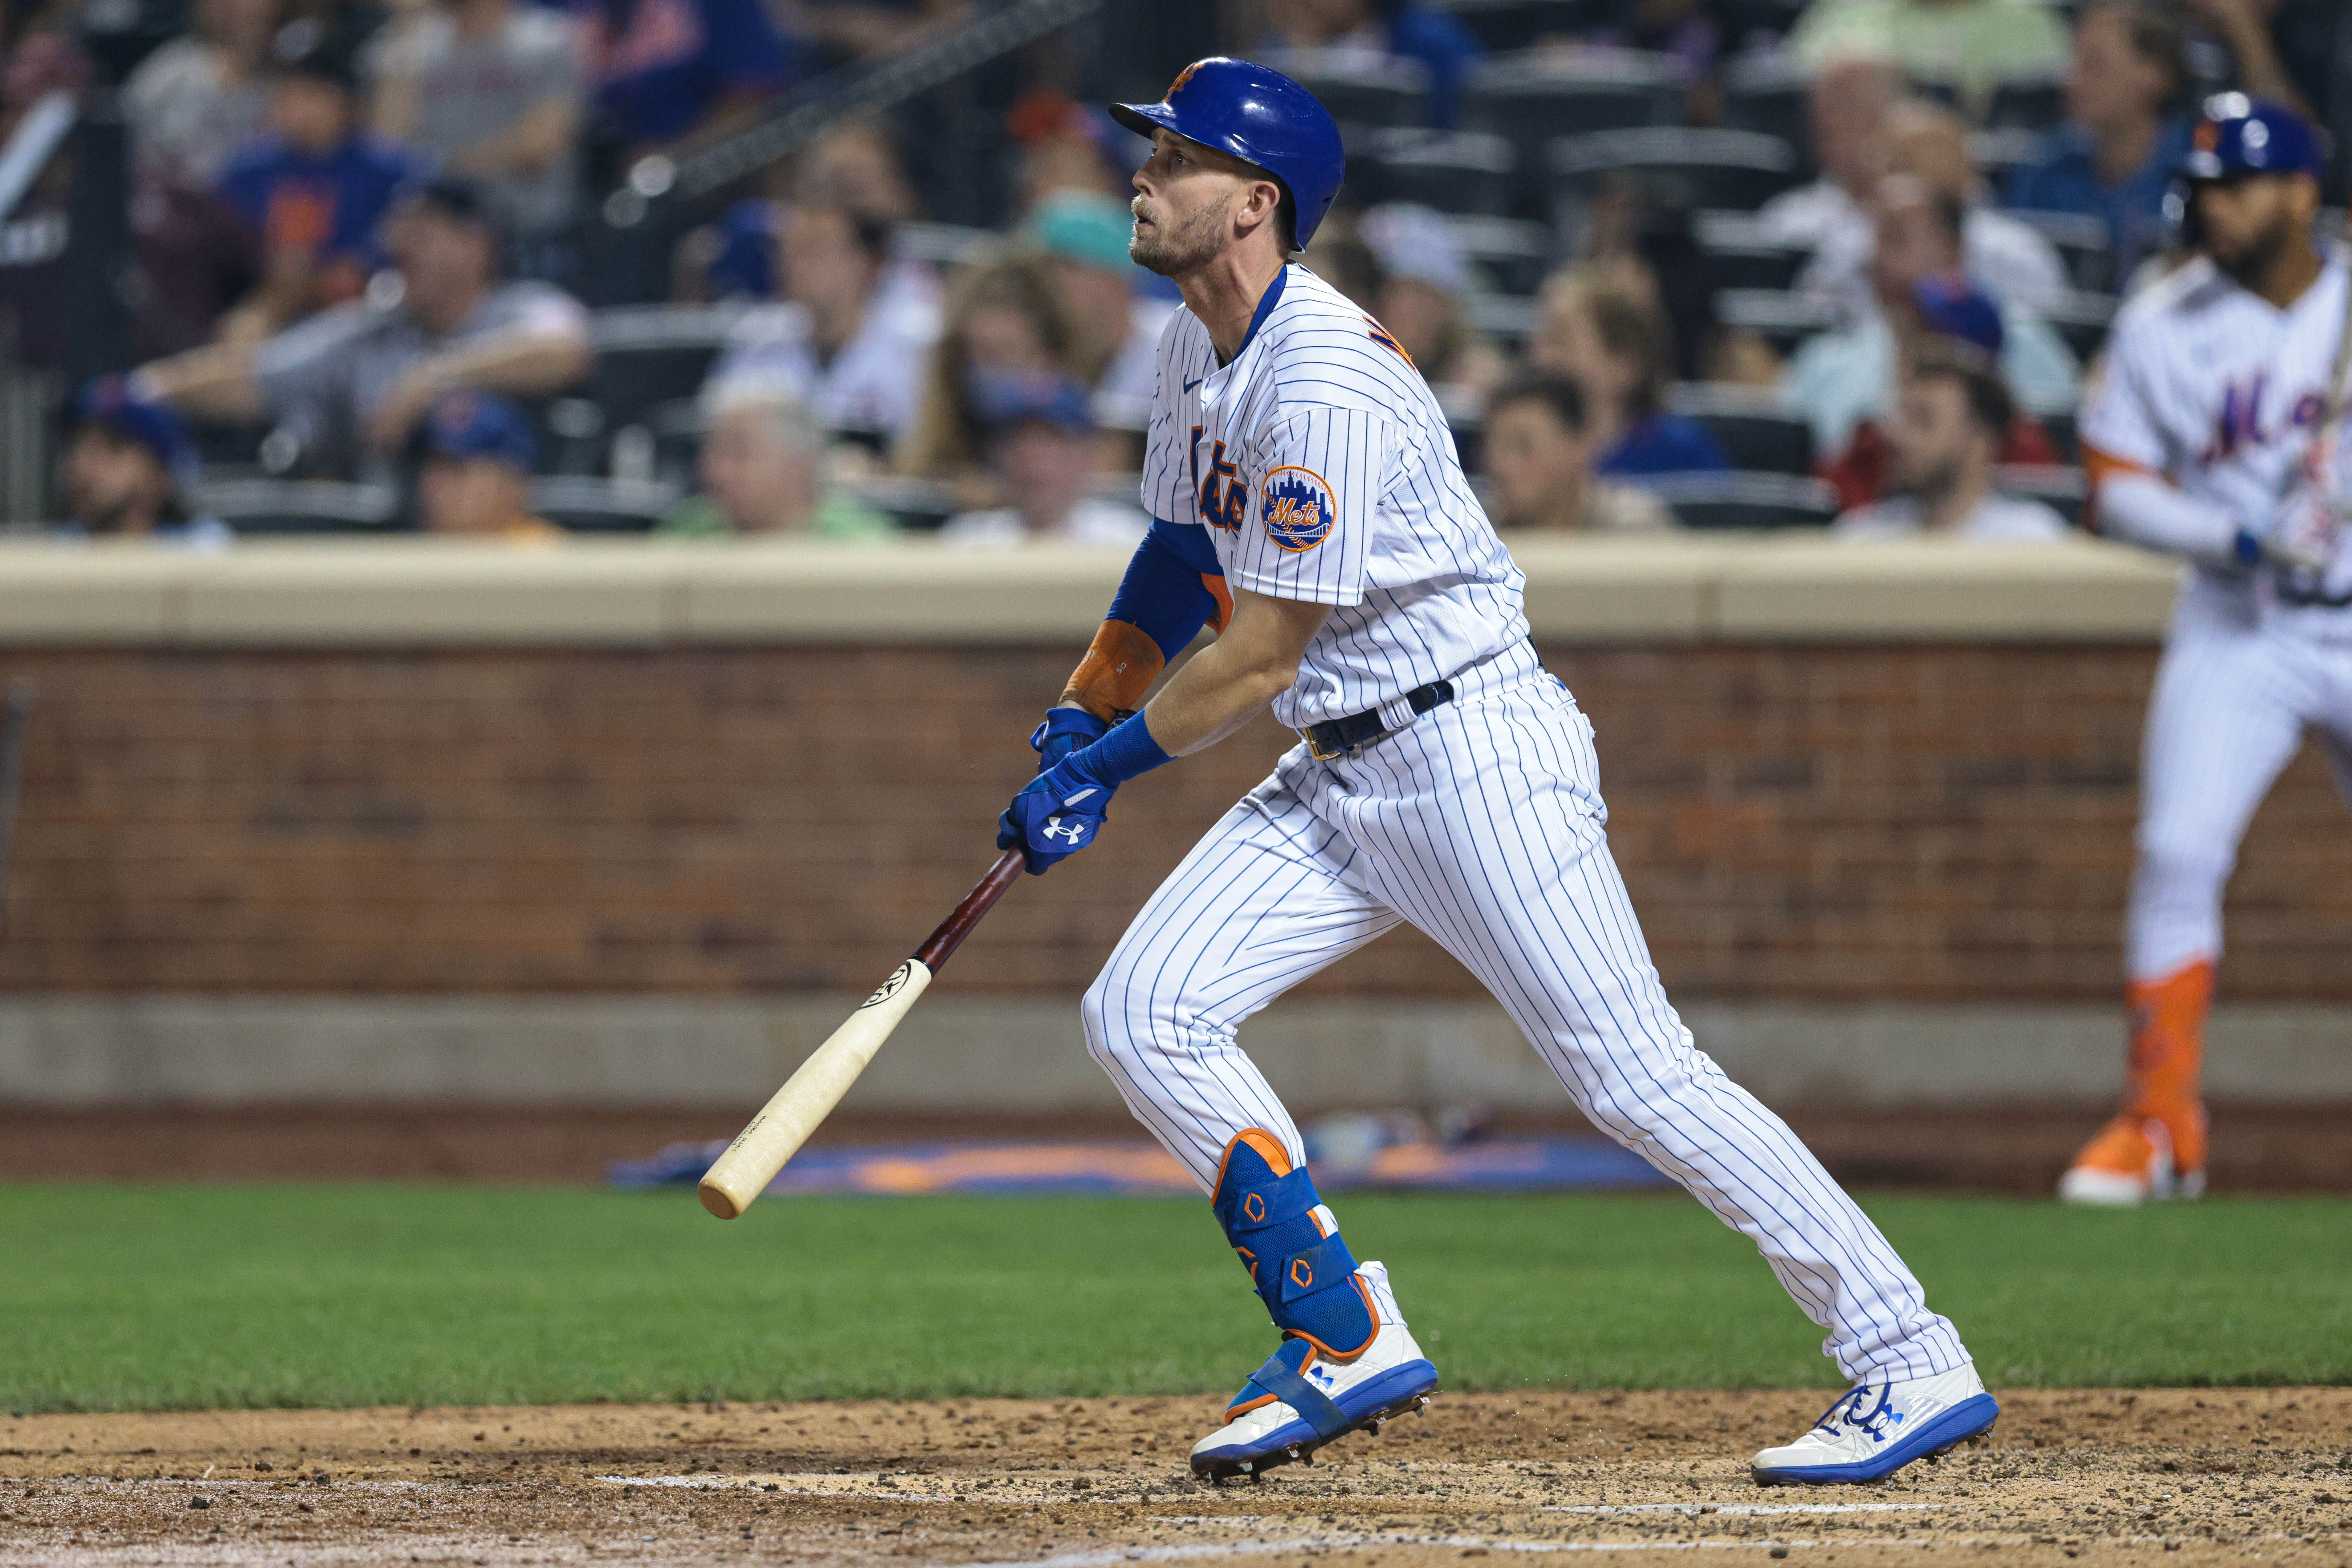 7/27/21 Game Preview: Atlanta Braves at New York Mets